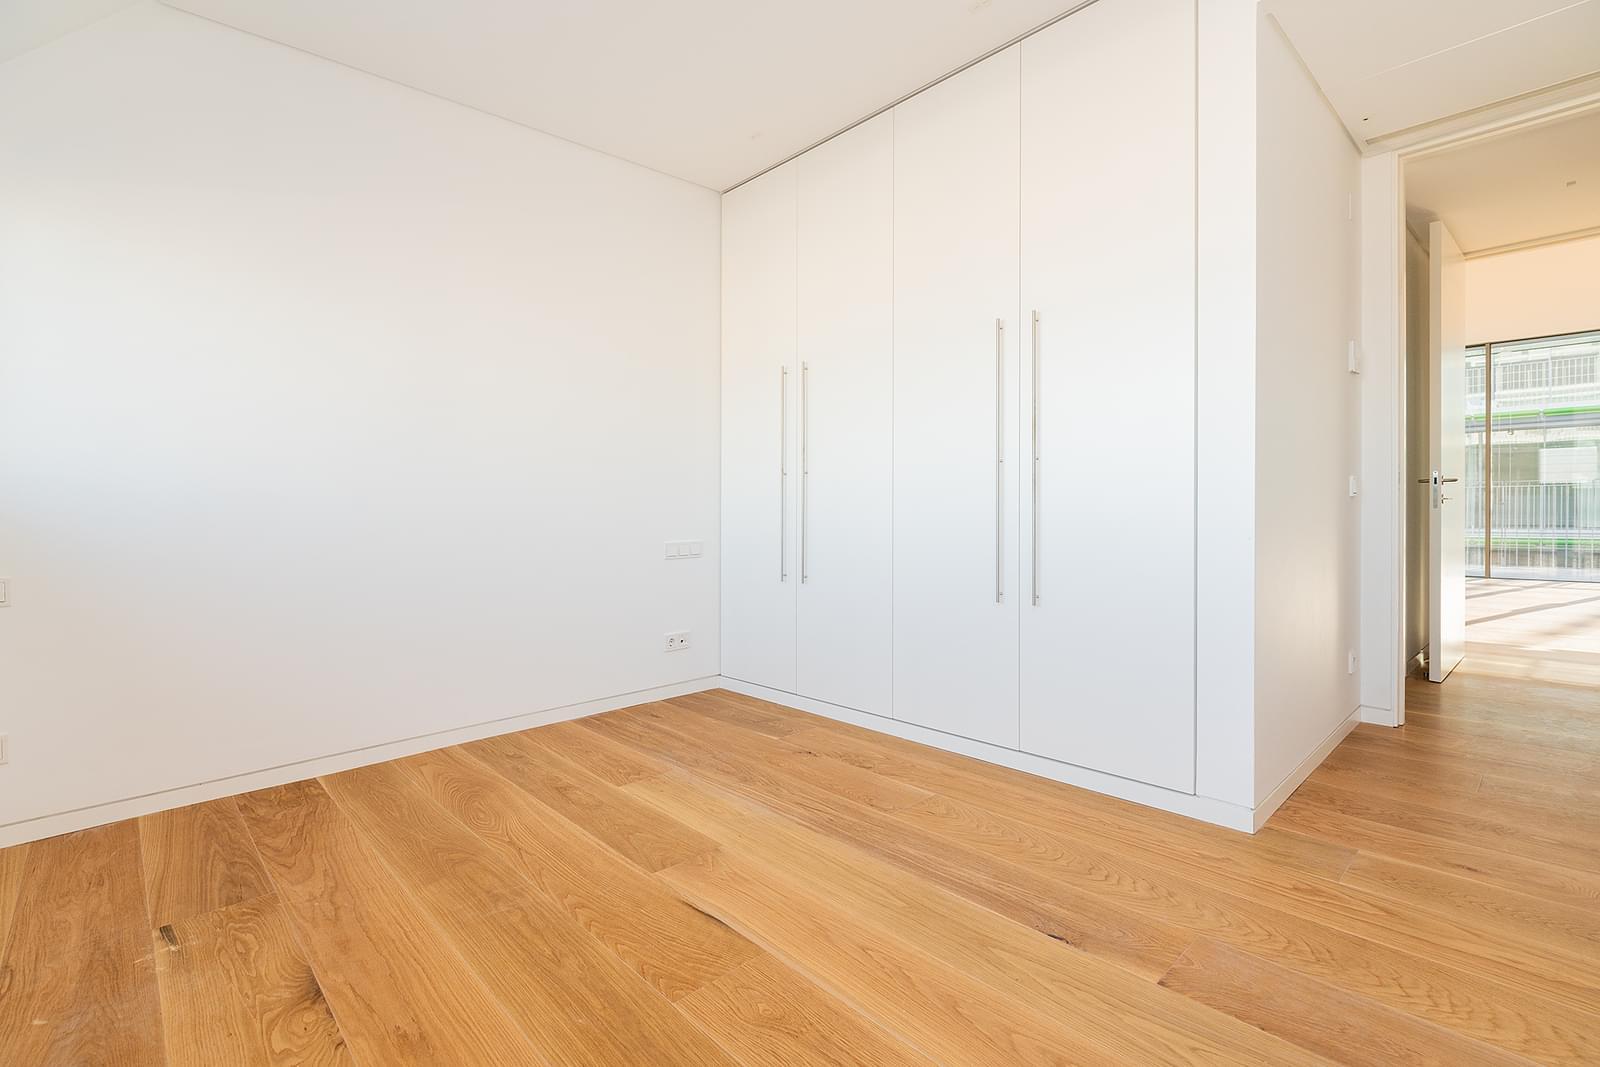 pf18713-apartamento-t3-lisboa-847f9f83-8347-4355-b4c2-2dd9a0913541